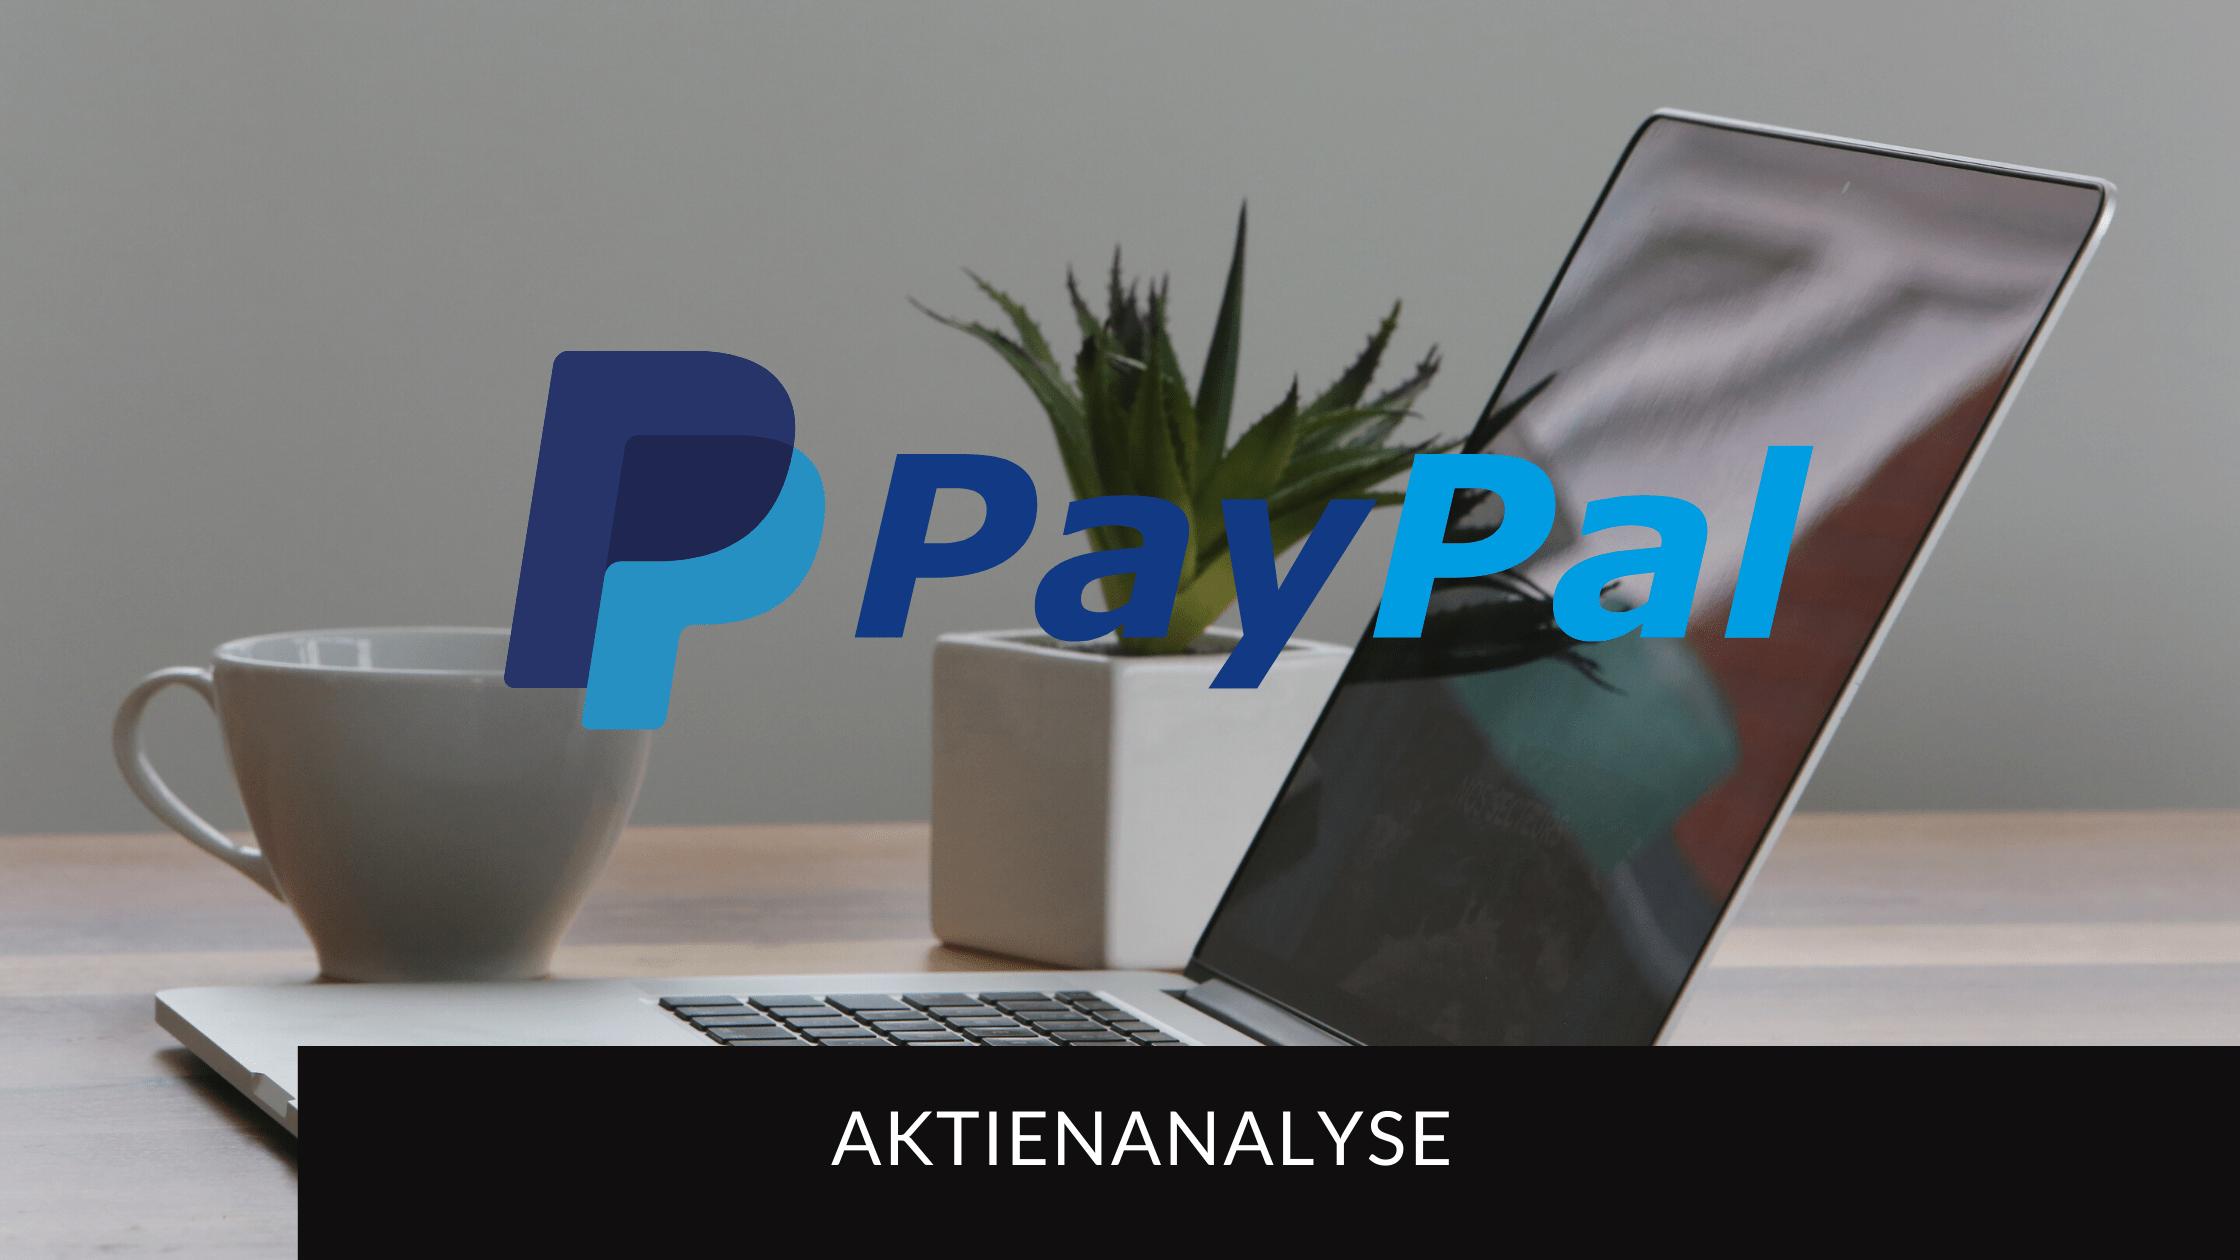 Paypal Aktienanalyse